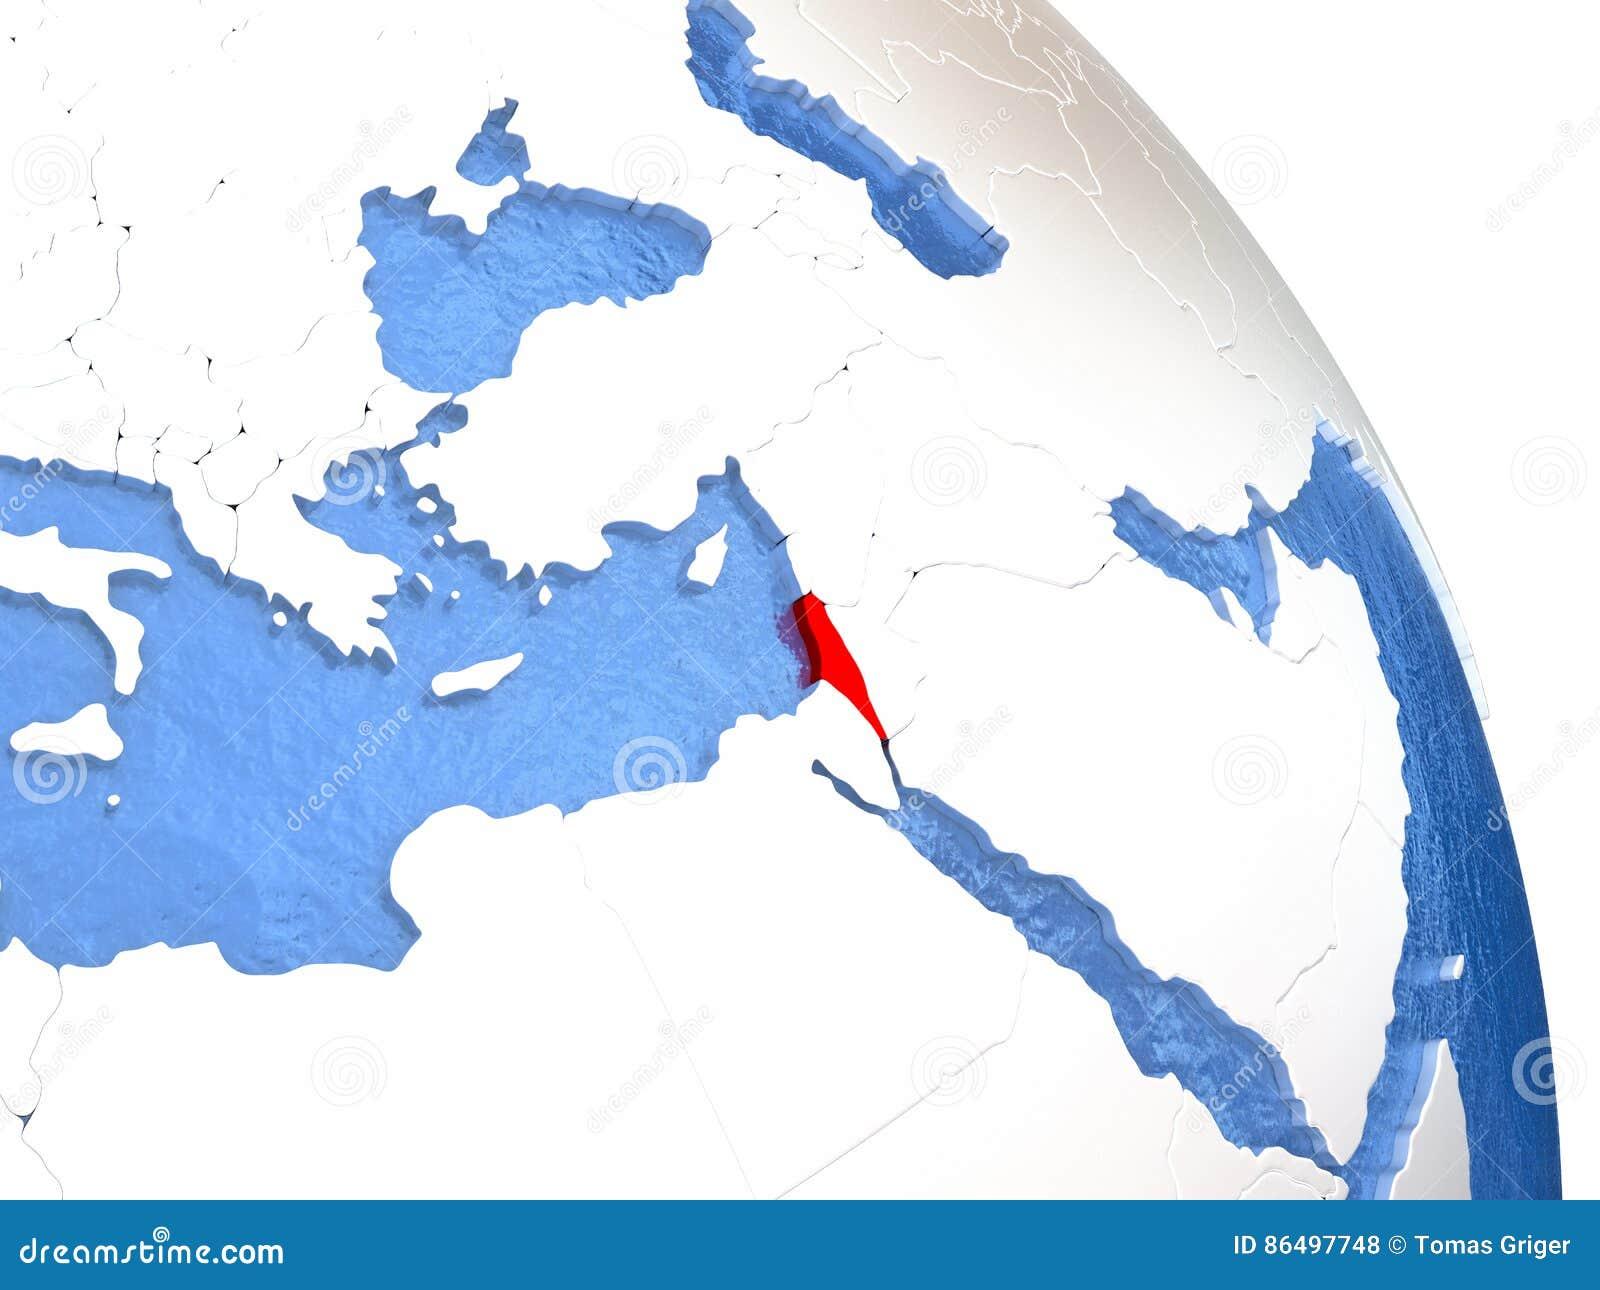 Israel on elegant globe stock illustration illustration of render israel highlighted in red on elegant silver globe with blue watery oceans 3d illustration gumiabroncs Images